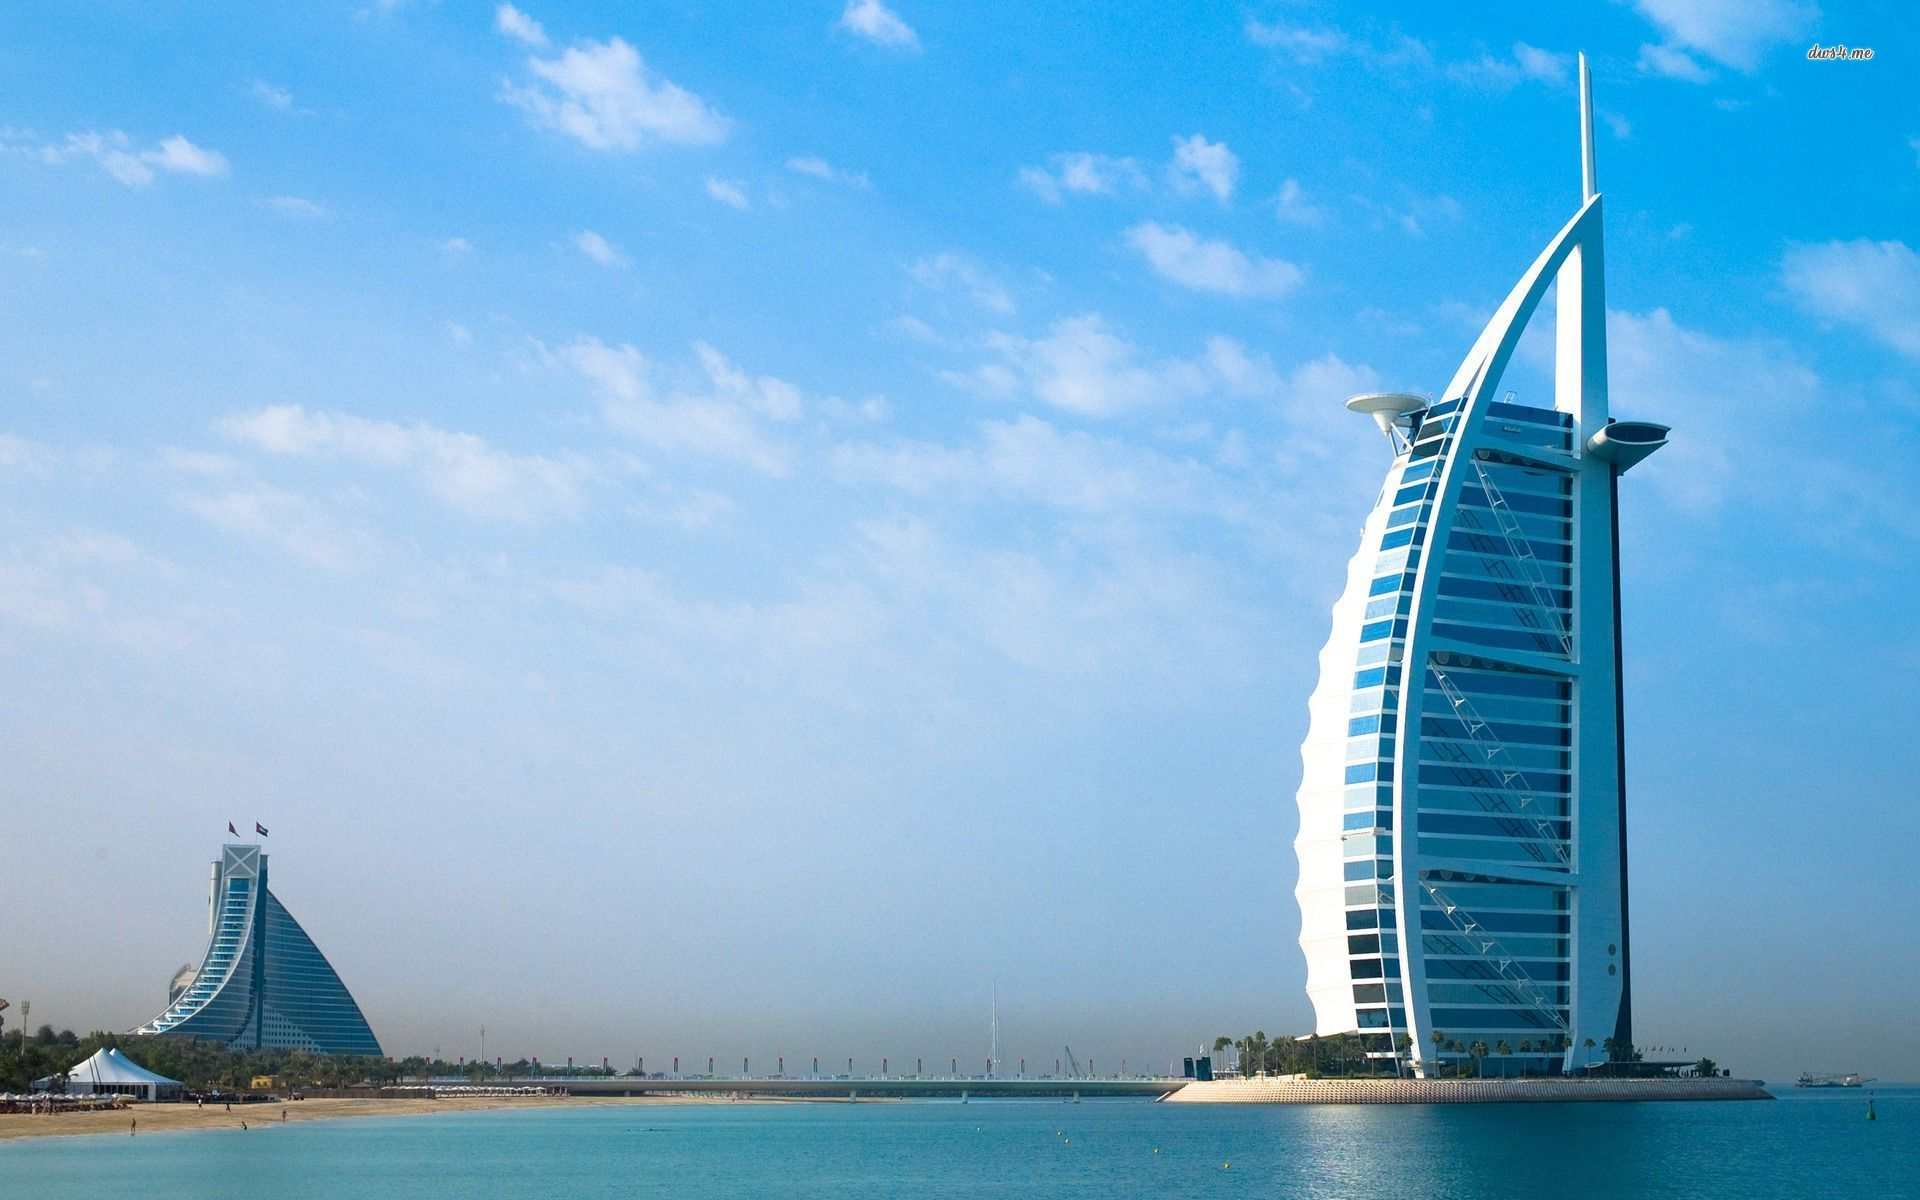 Burj al arab wallpapers pictures images for The burg hotel dubai